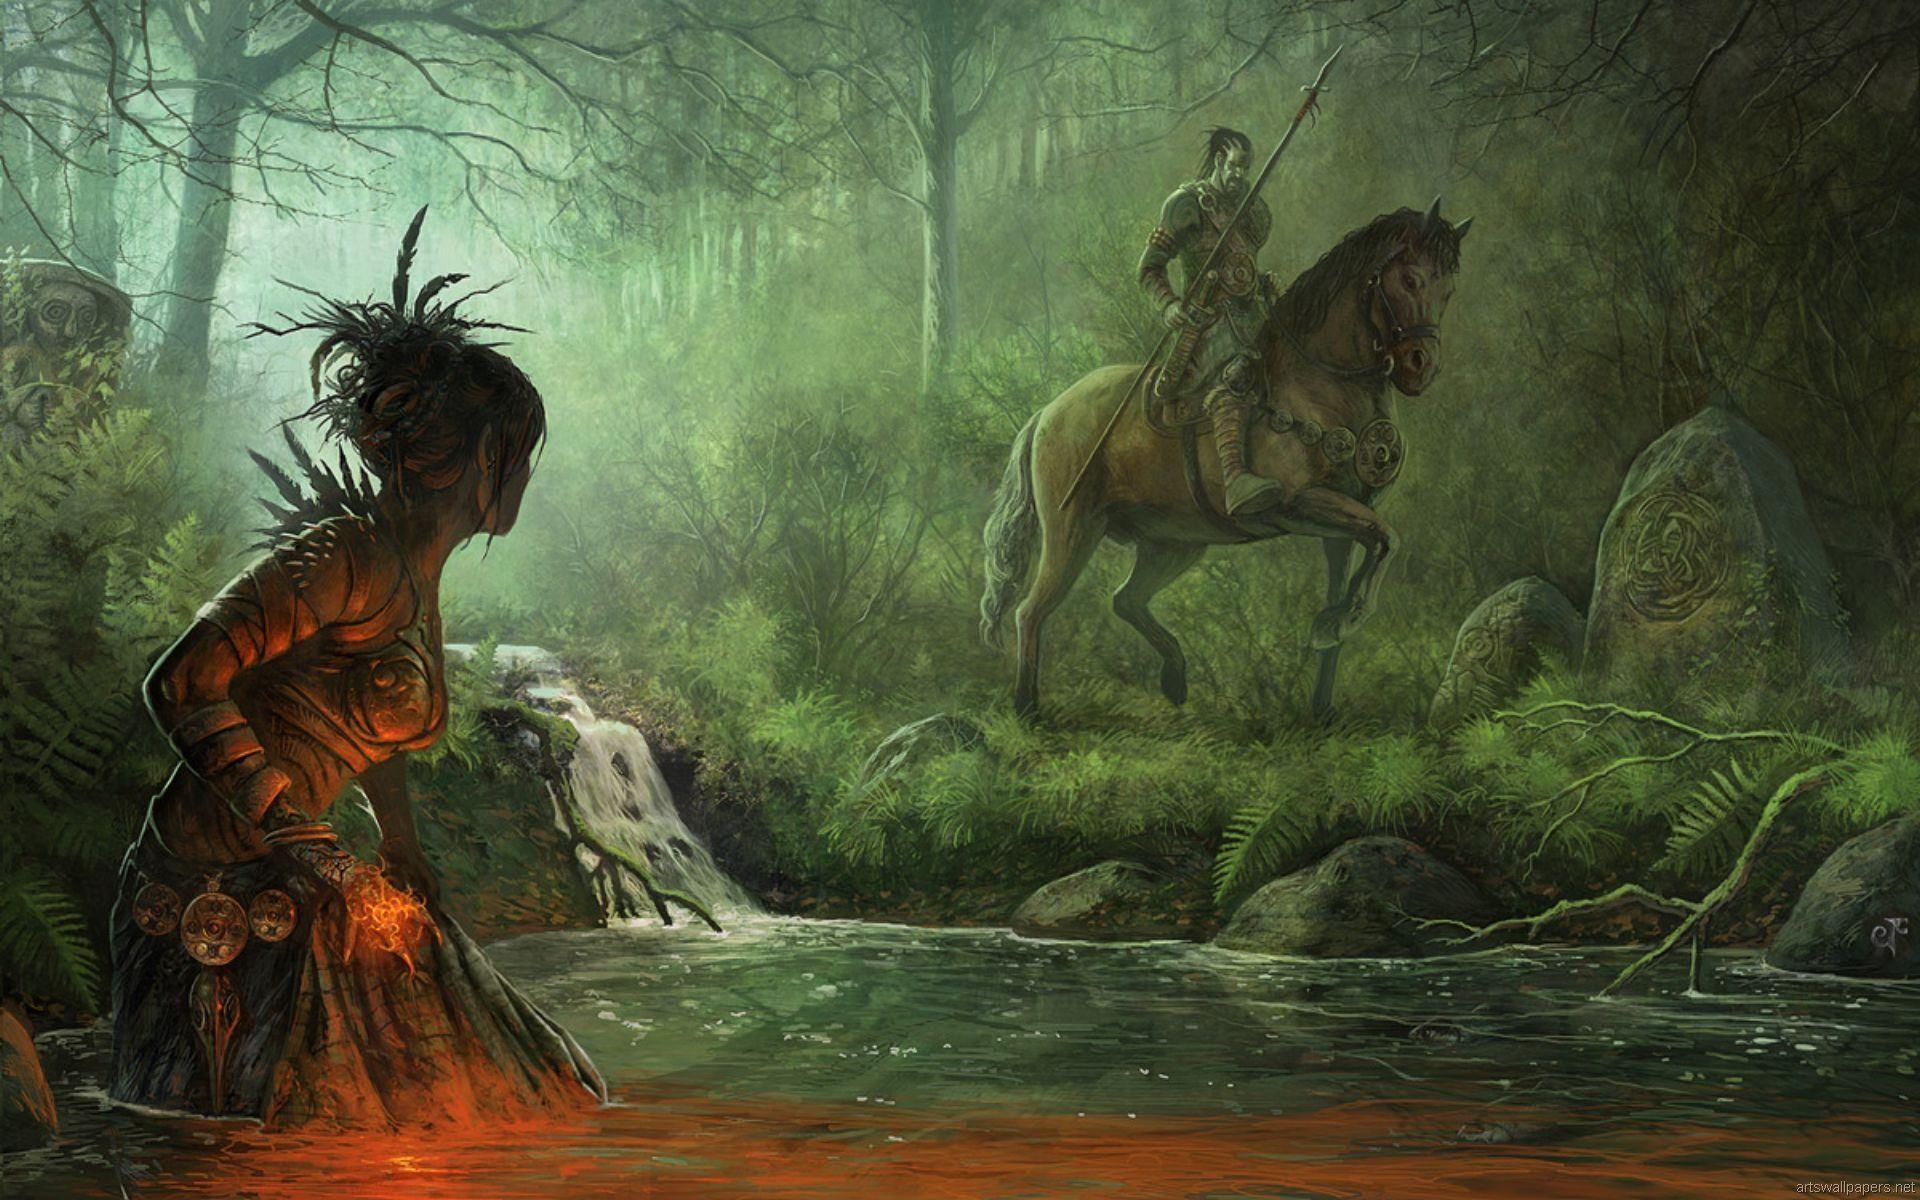 Resultado de imagen para got first men vs children of the forest